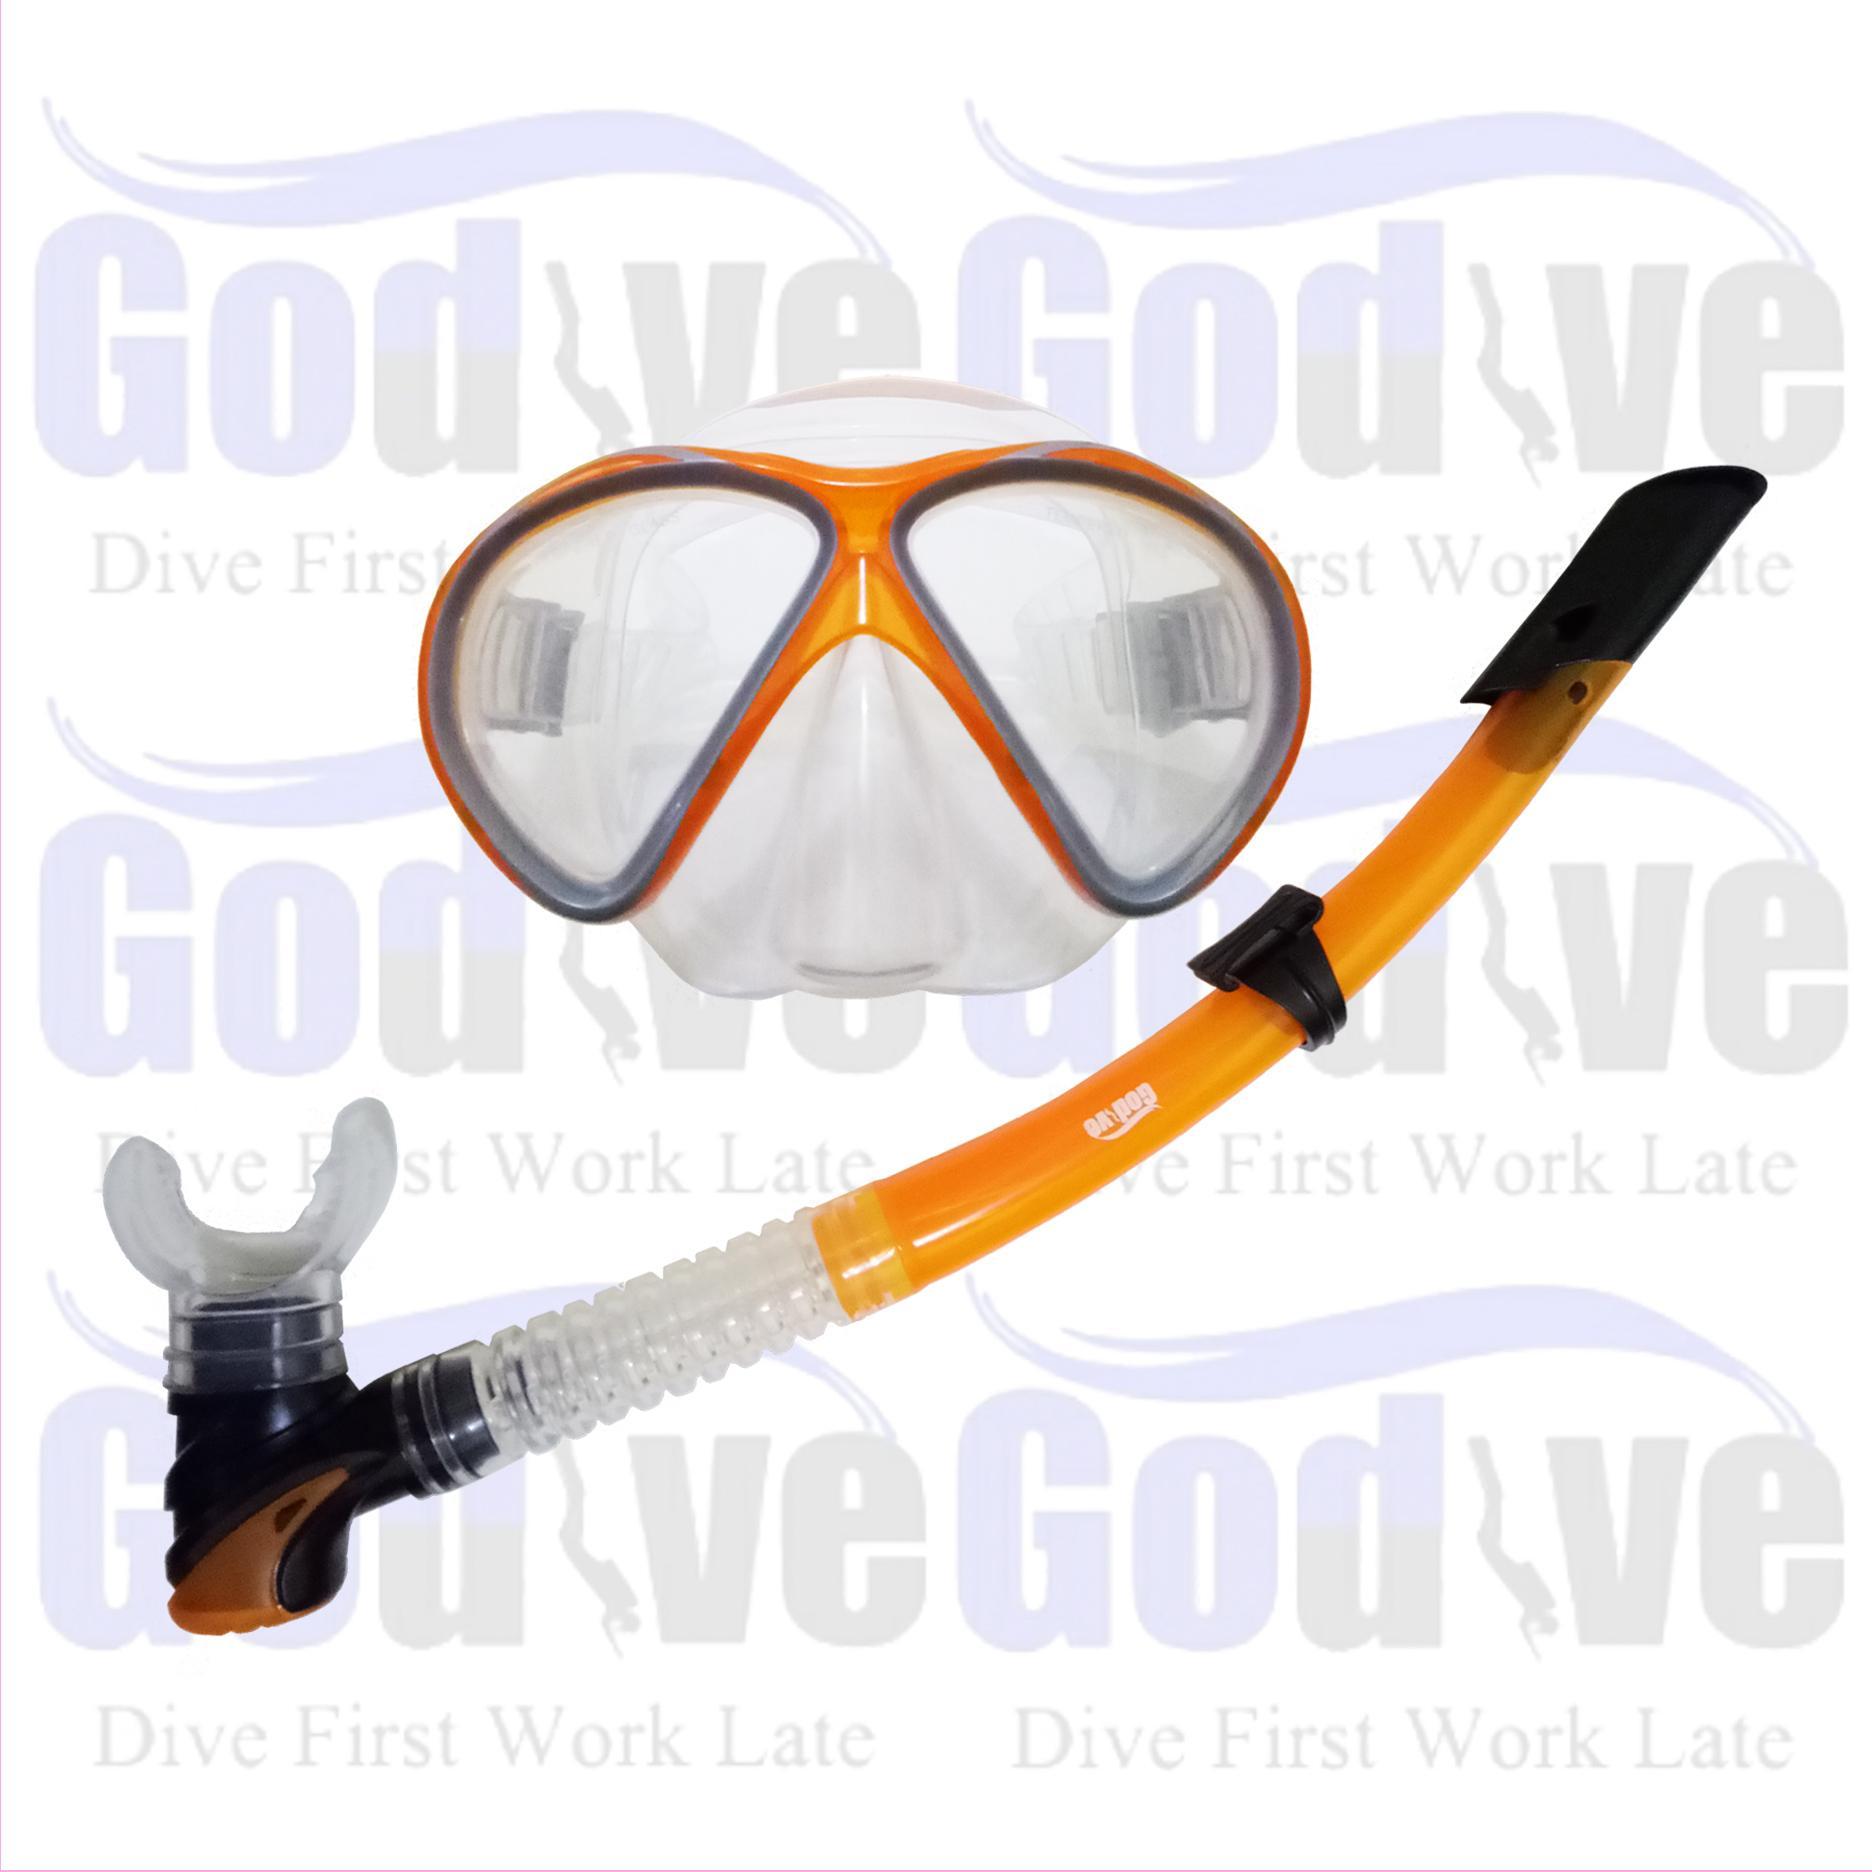 ... Fin Full Heel Fs 04 37 38; Page - 2. Alat Selam Godive Snorkeling Mask & Snorkle Set M6201Rp379 000